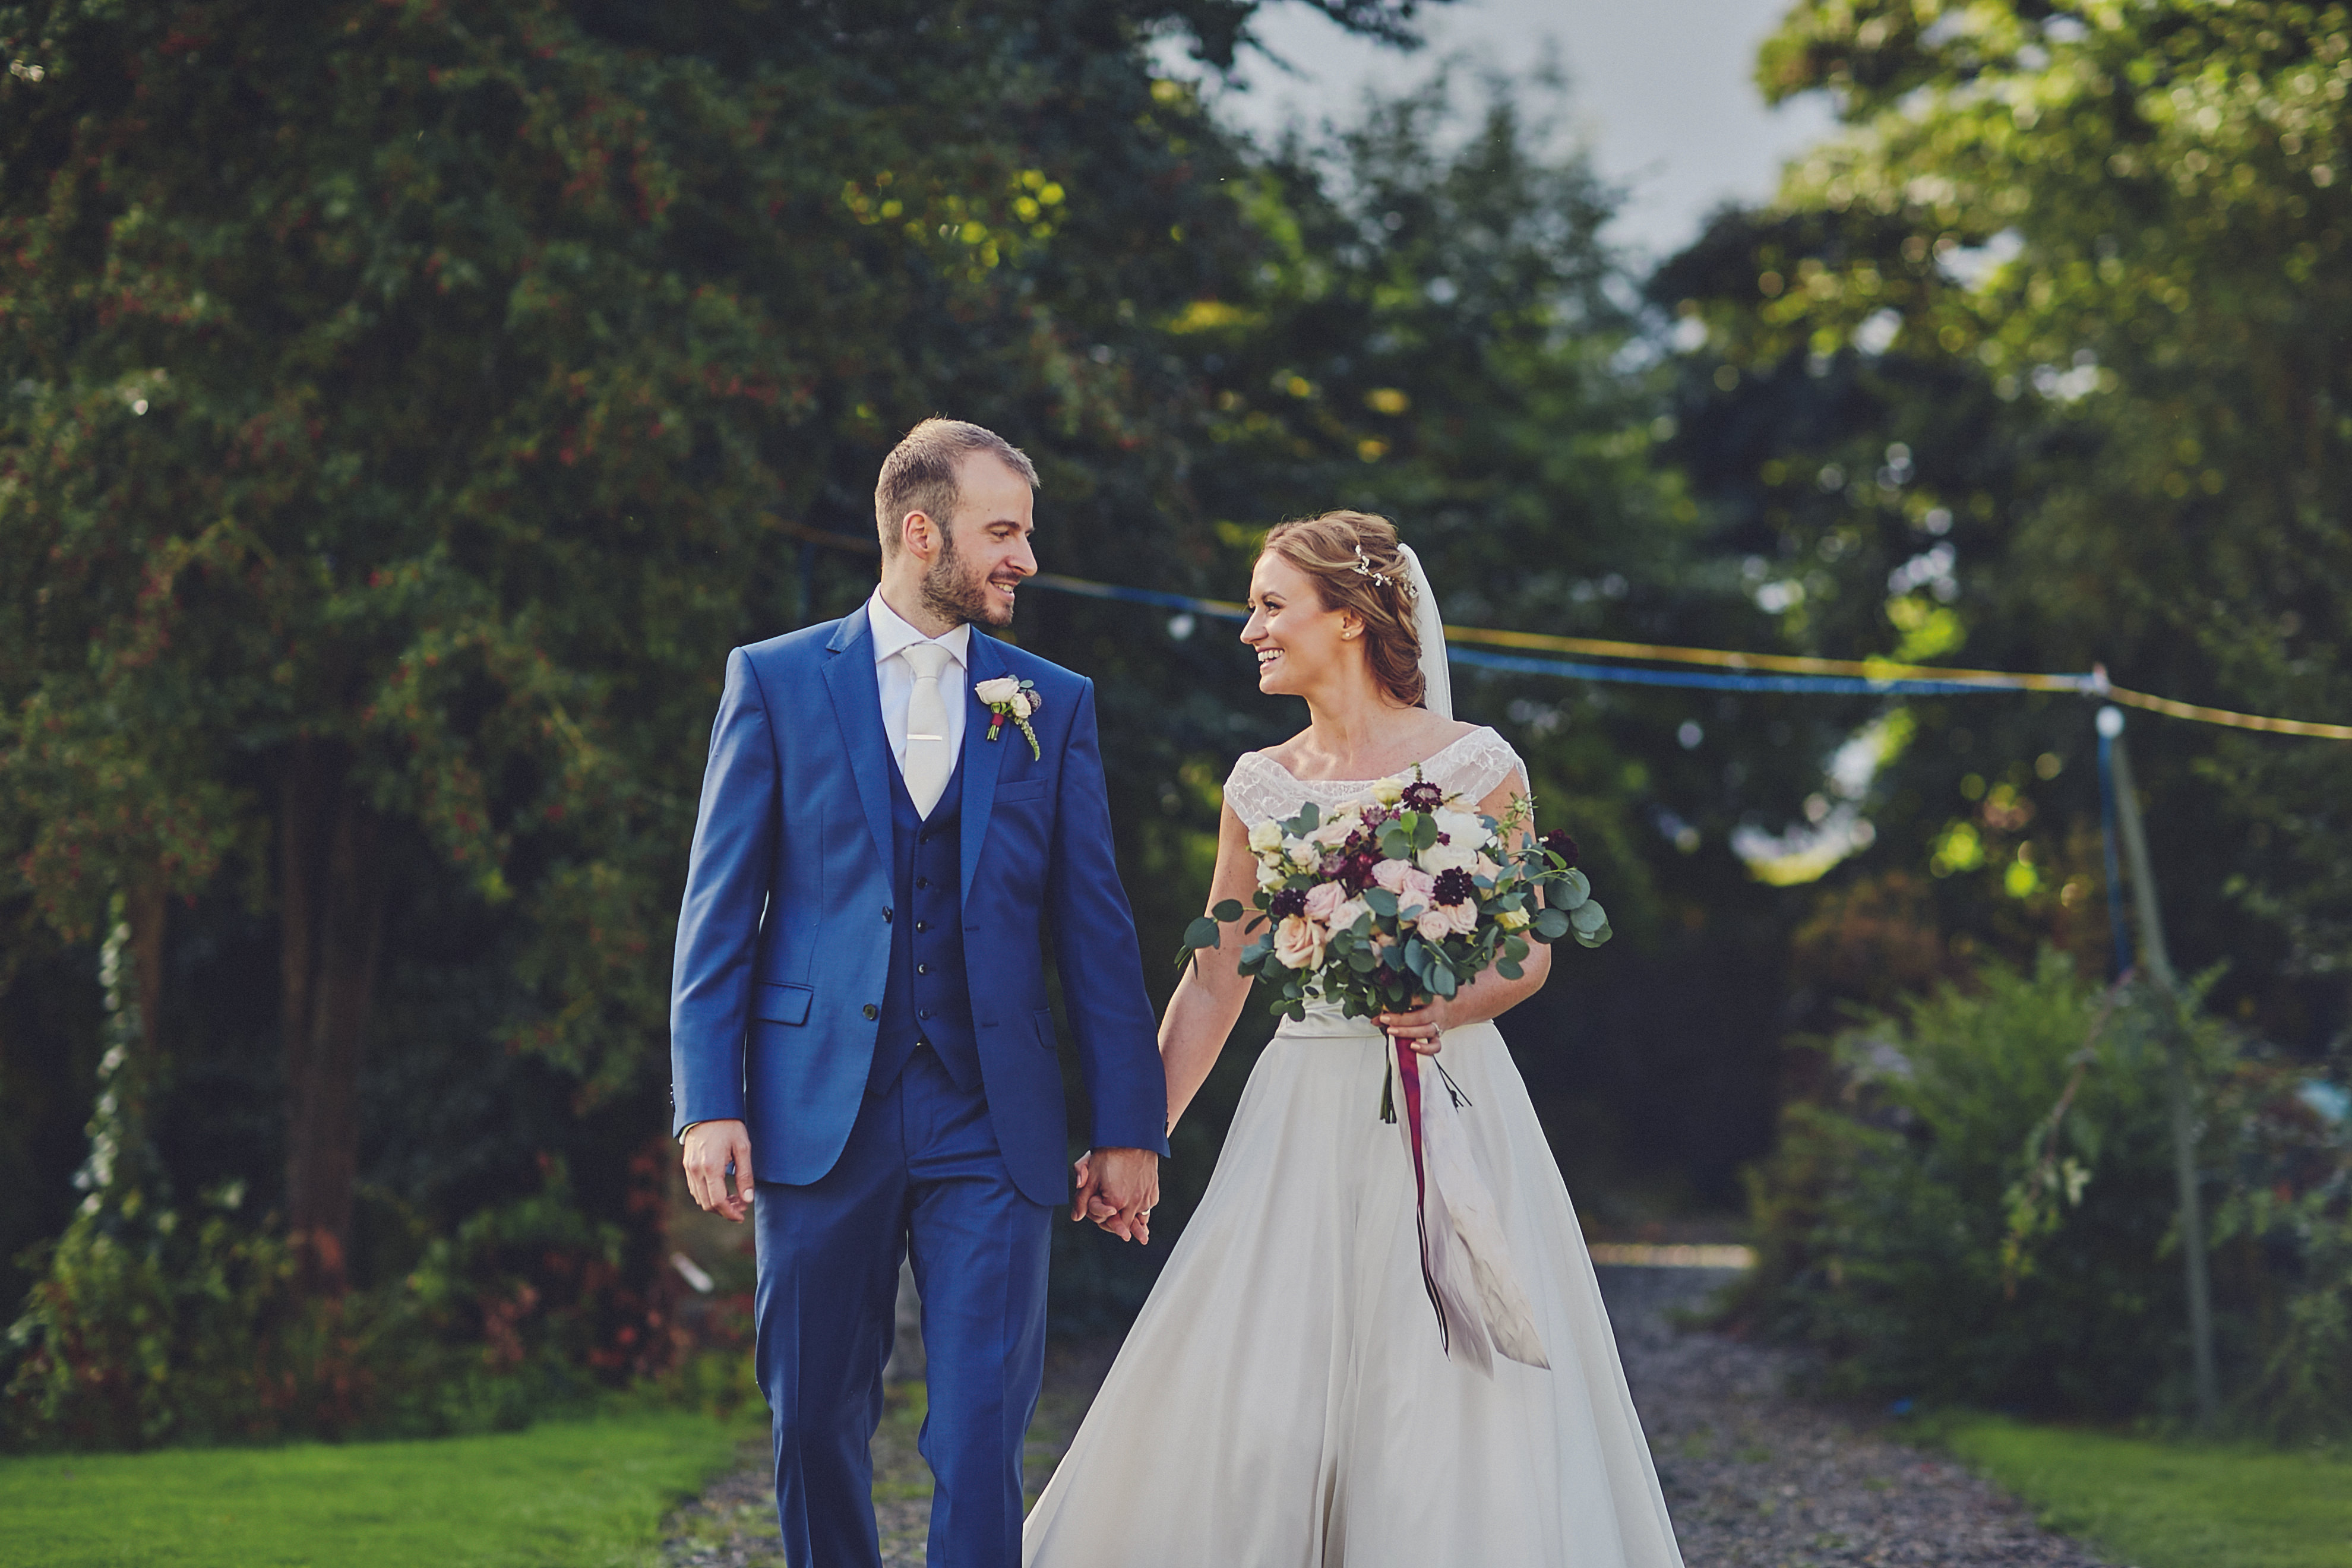 Cloughjordan House weddding109 - Cloughjordan House Wedding - Alternative Venue